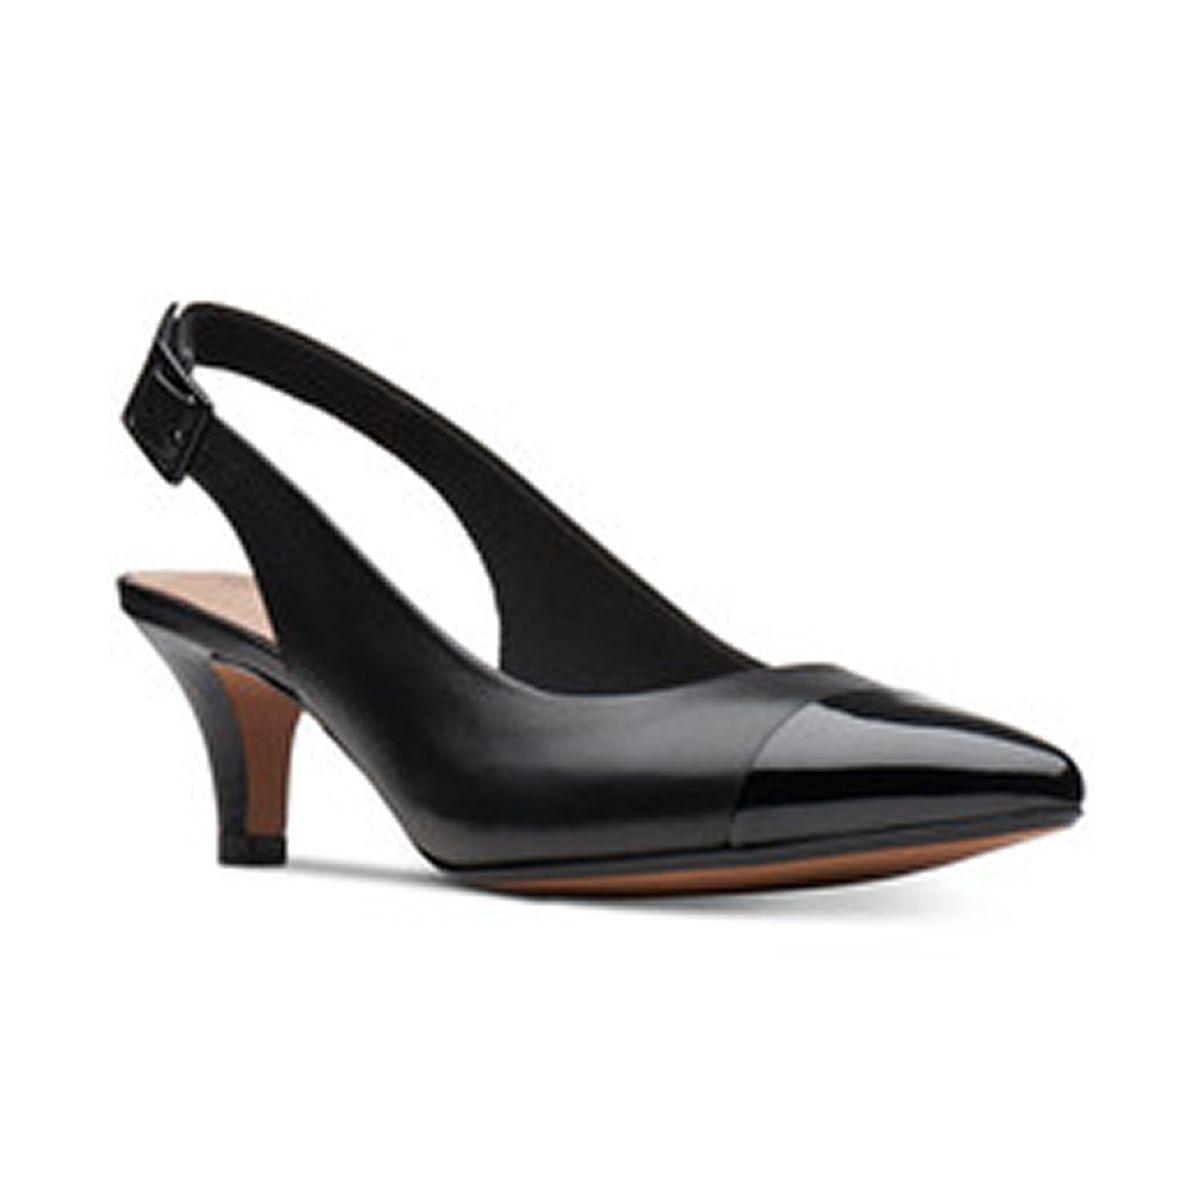 86d0da97eeb Clarks High Heels - Macy s